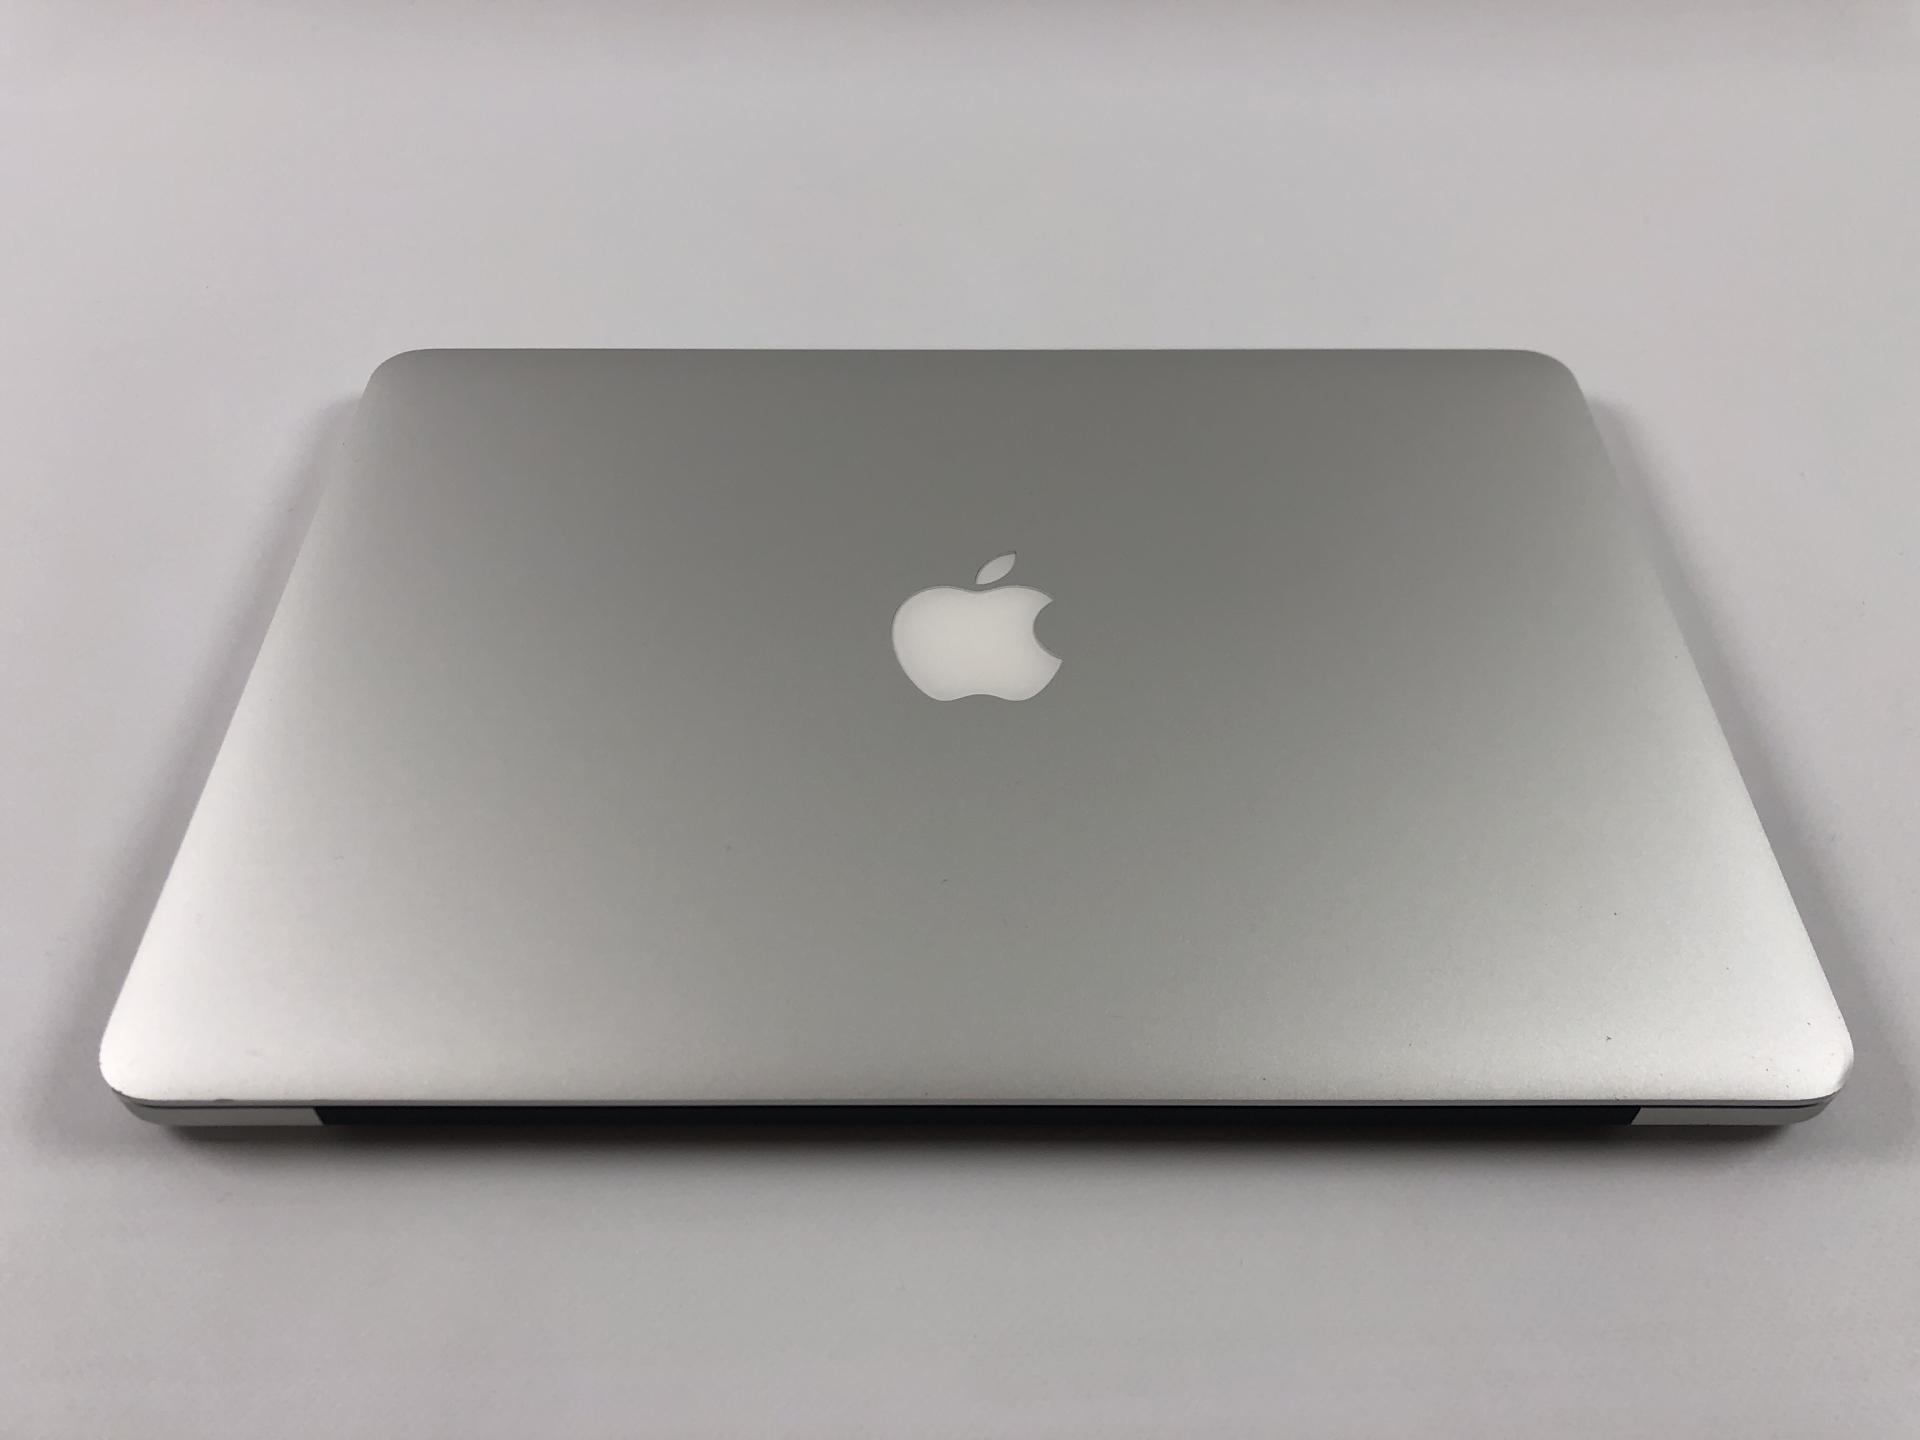 "MacBook Pro Retina 13"" Mid 2014 (Intel Core i5 2.6 GHz 8 GB RAM 256 GB SSD), Intel Core i5 2.6 GHz, 8 GB RAM, 256 GB SSD, obraz 2"